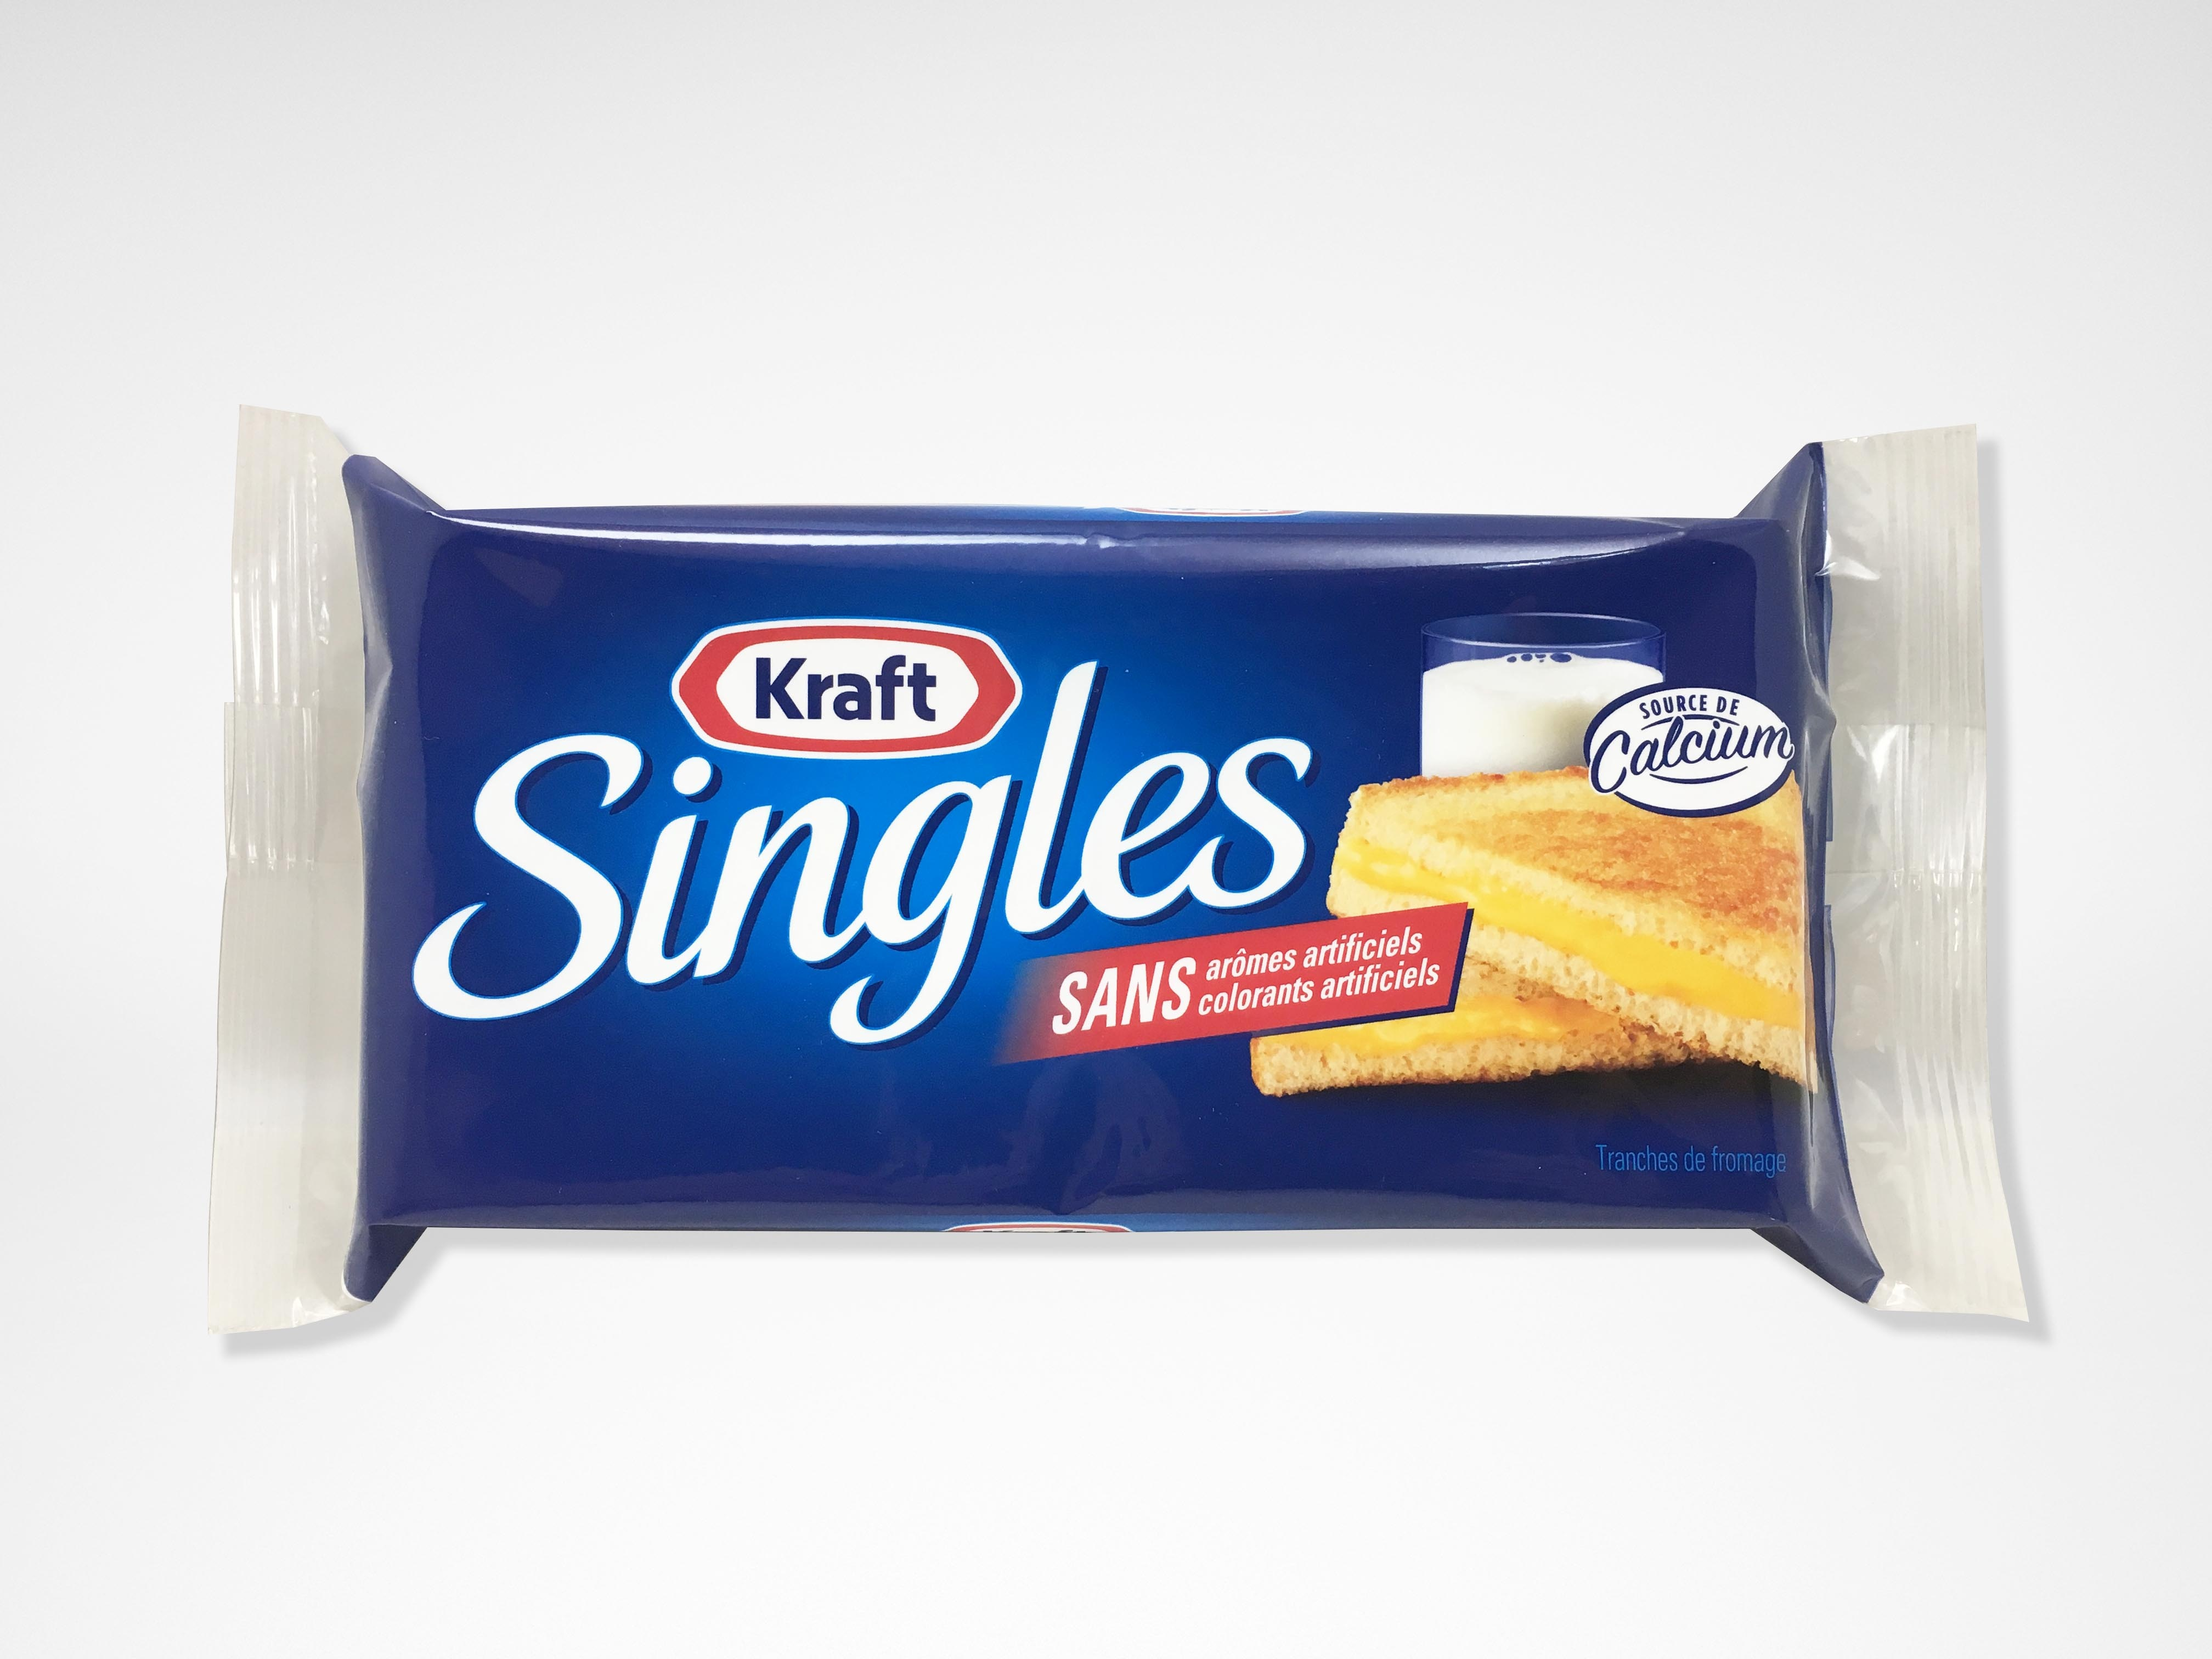 https://0901.nccdn.net/4_2/000/000/00d/f43/Kraft-Singles--4032x3024.jpg